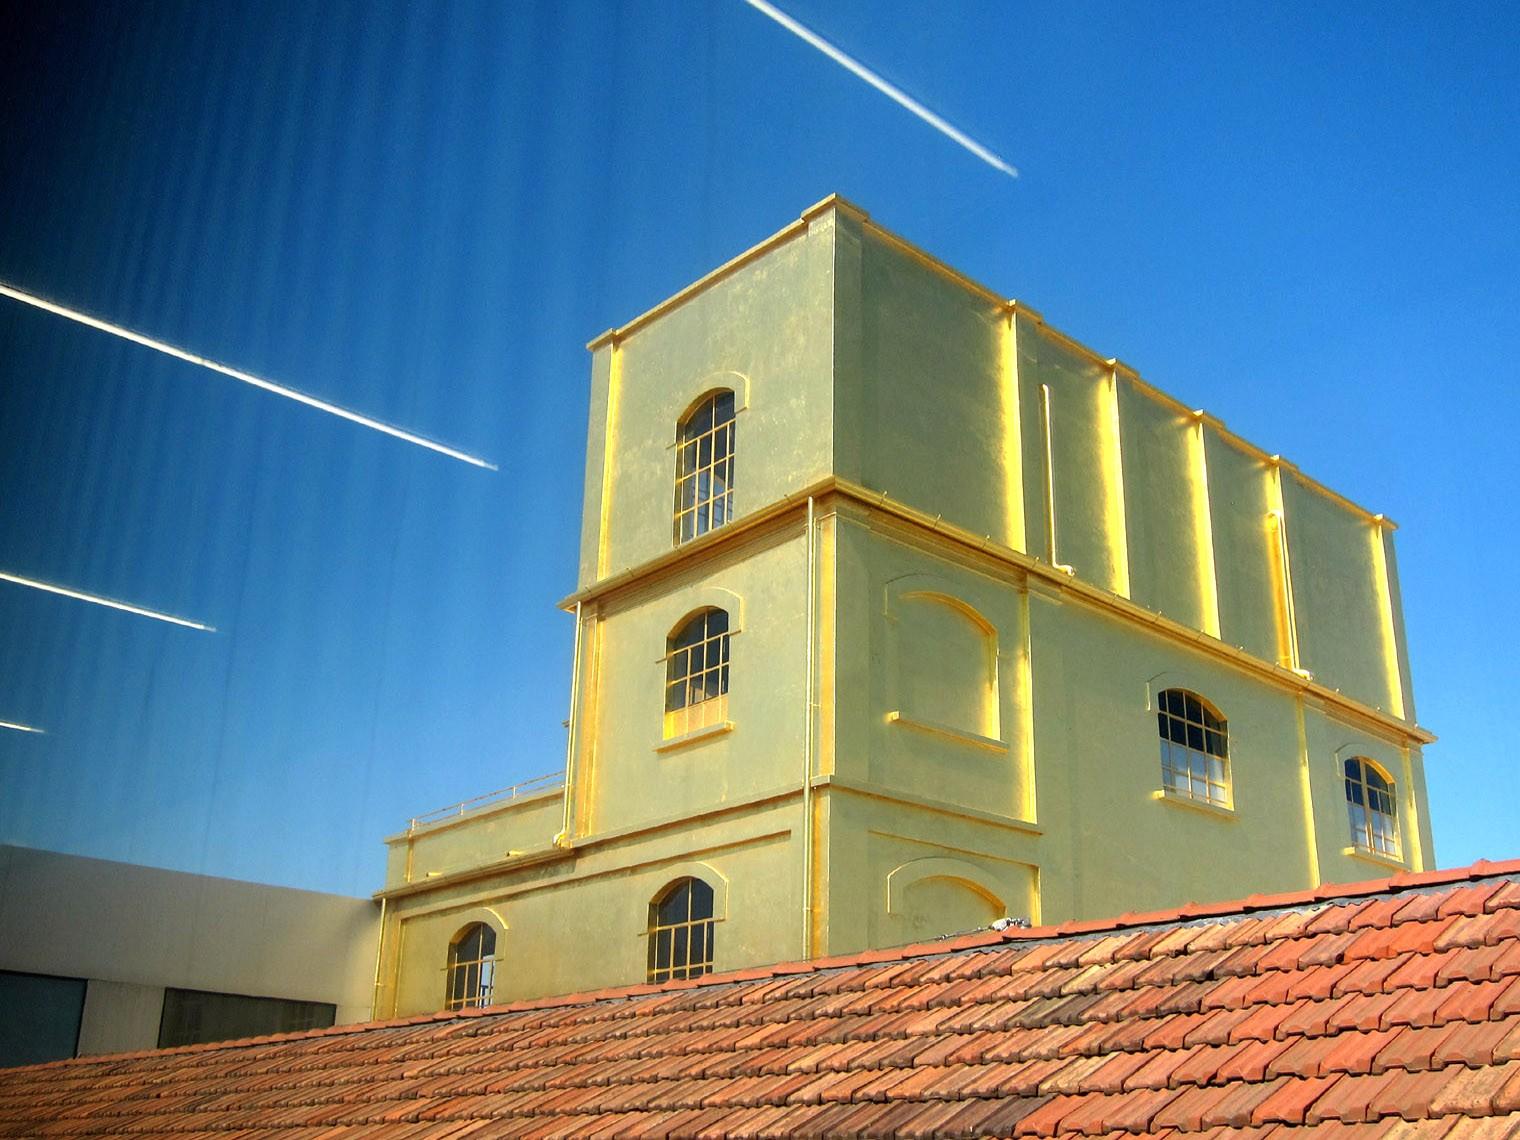 Hounted House Fondazione Prada